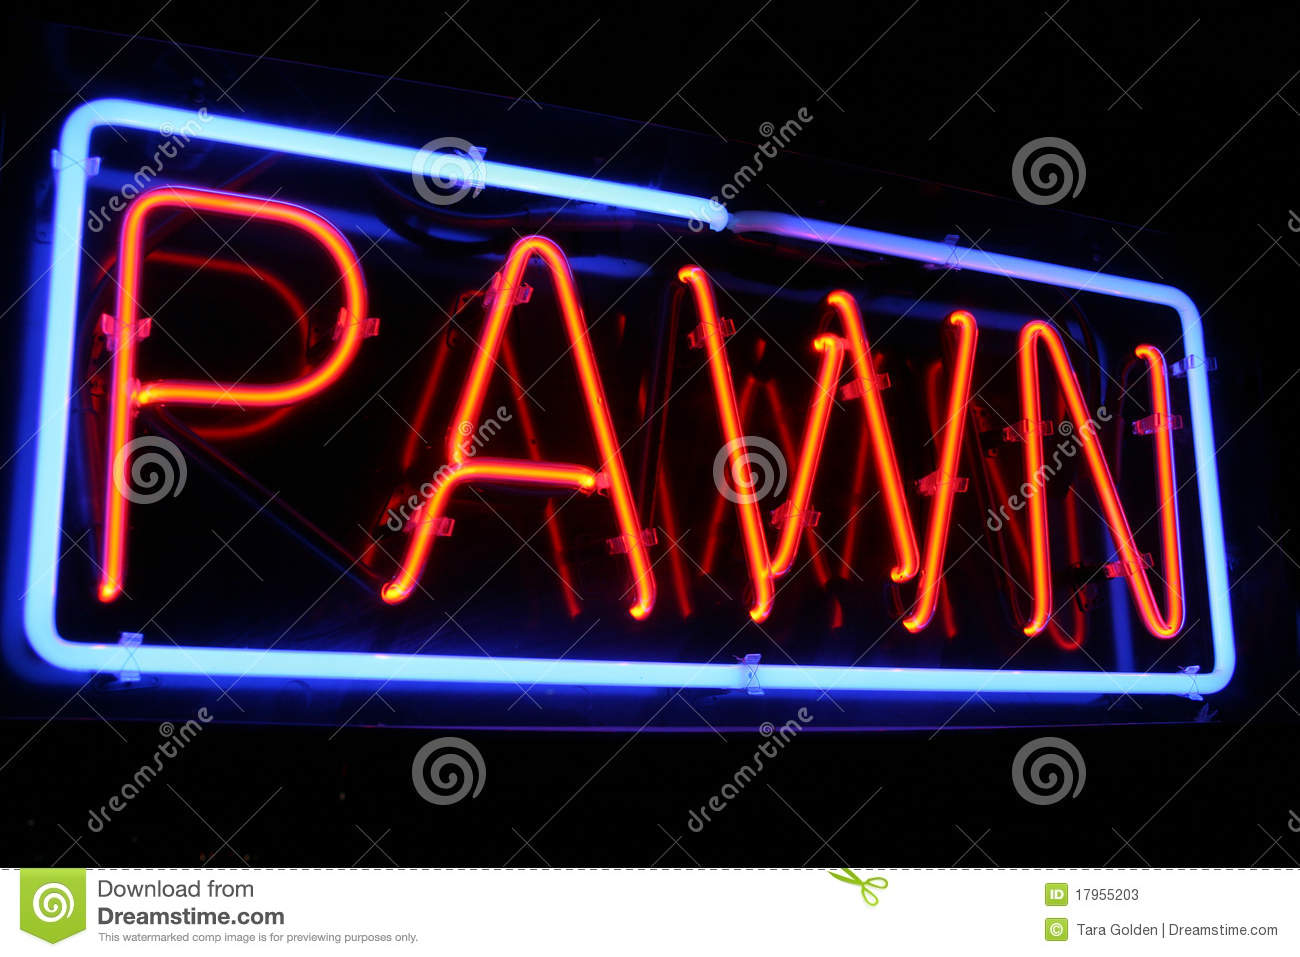 Pawnshop (Germiston)